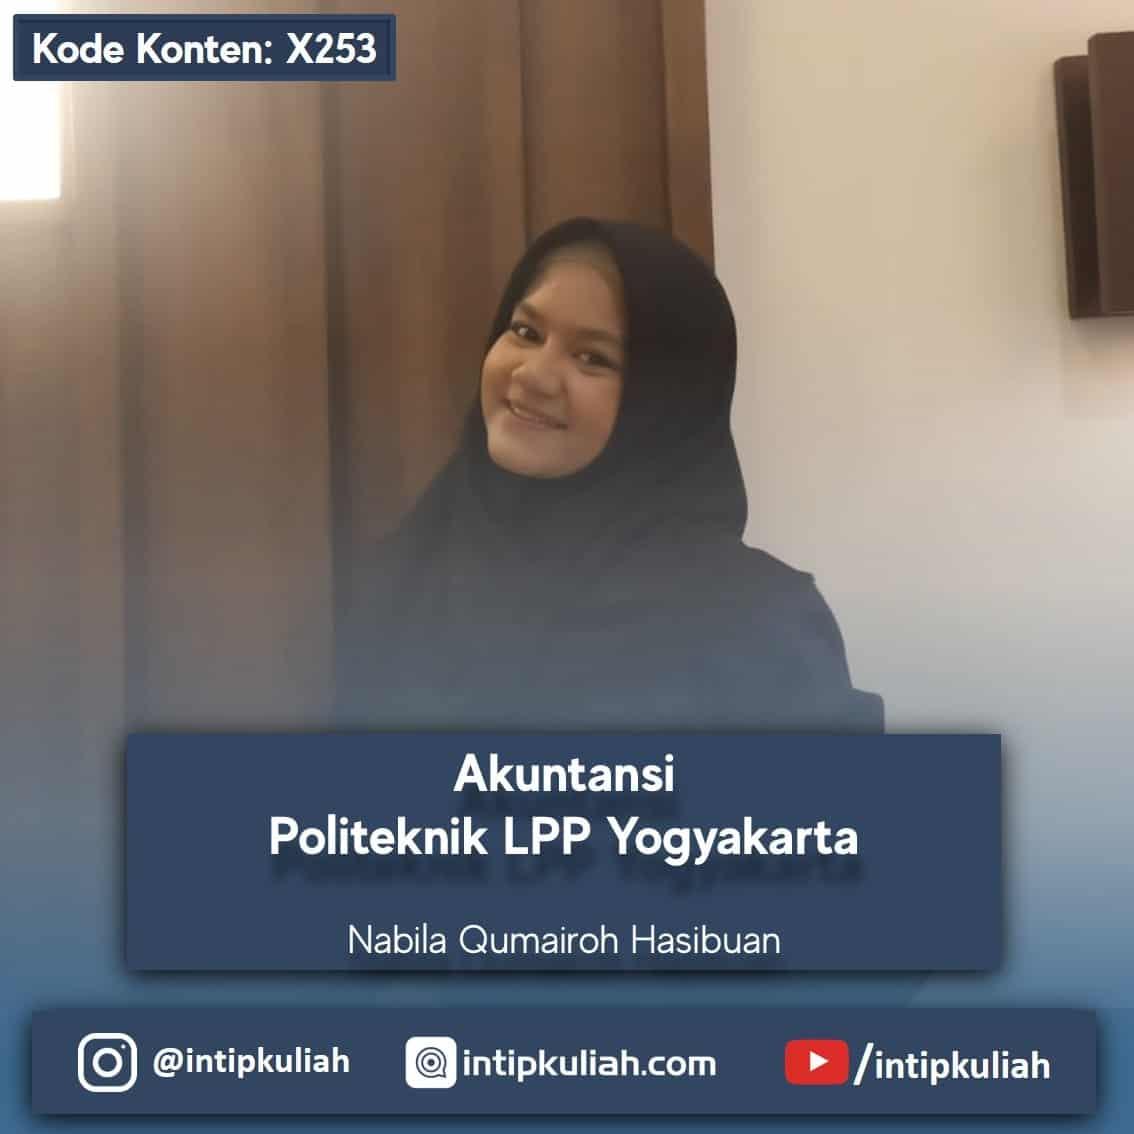 Akuntansi Politeknik LPP Yogyakarta (Nabila)